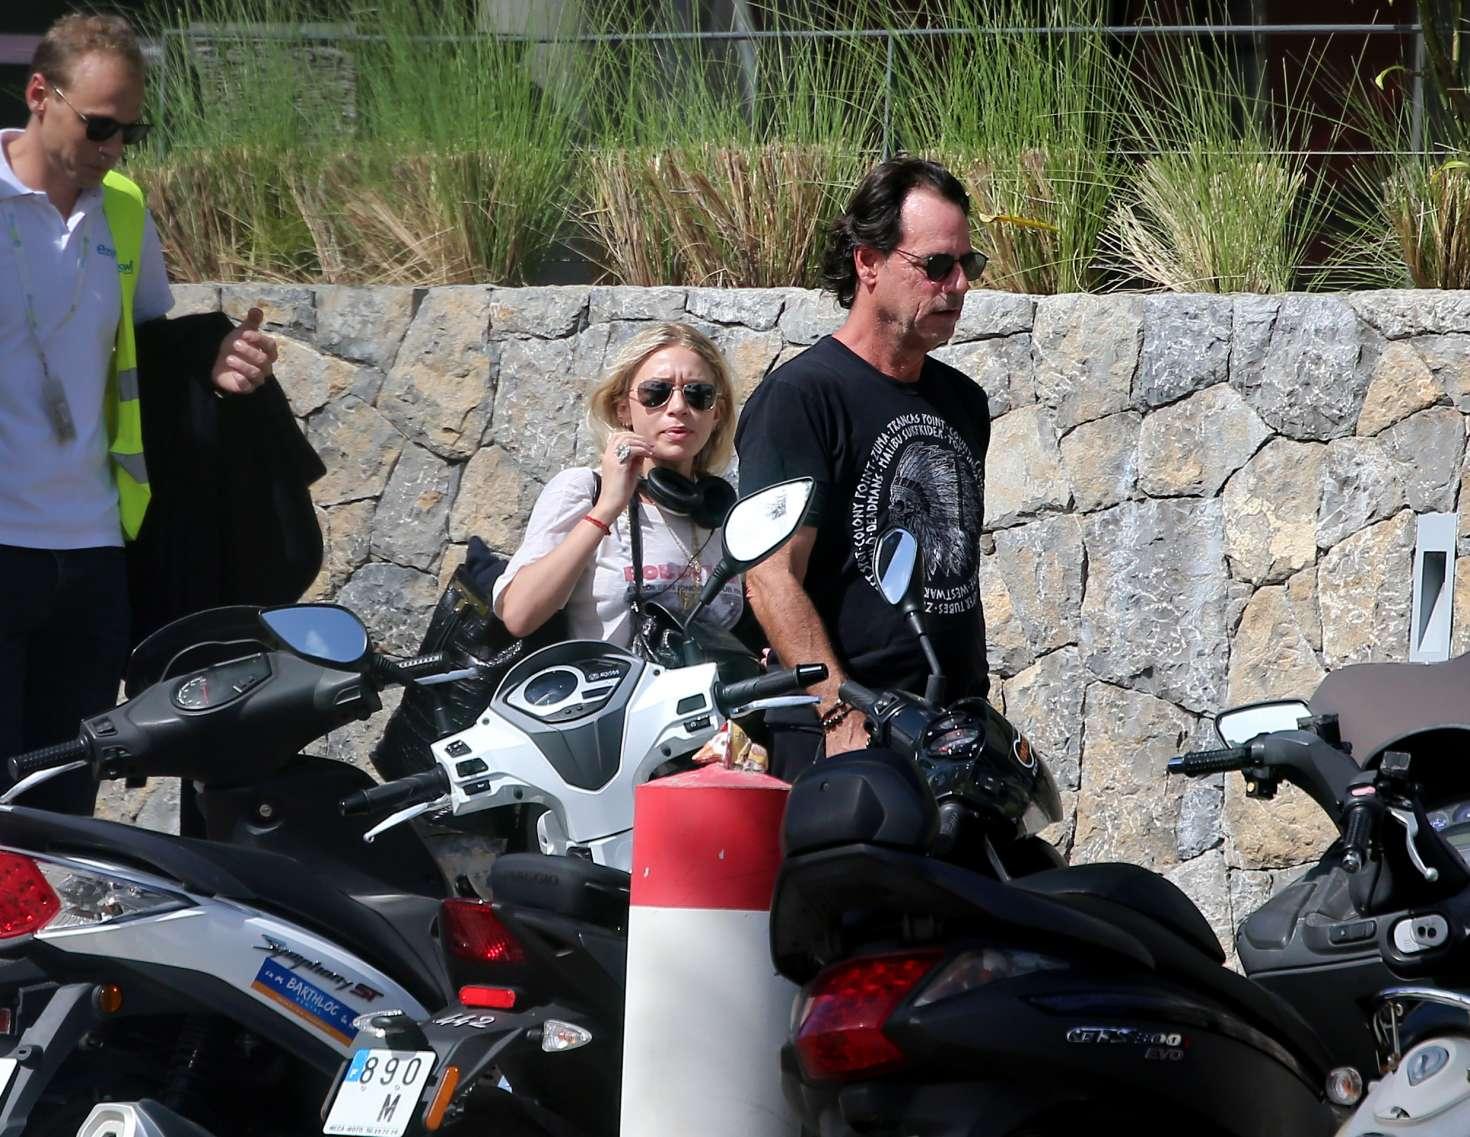 Ashley Olsen 2016 : Ashley Olsen and Boyfriend Richard Sachs in Saint Barts -01